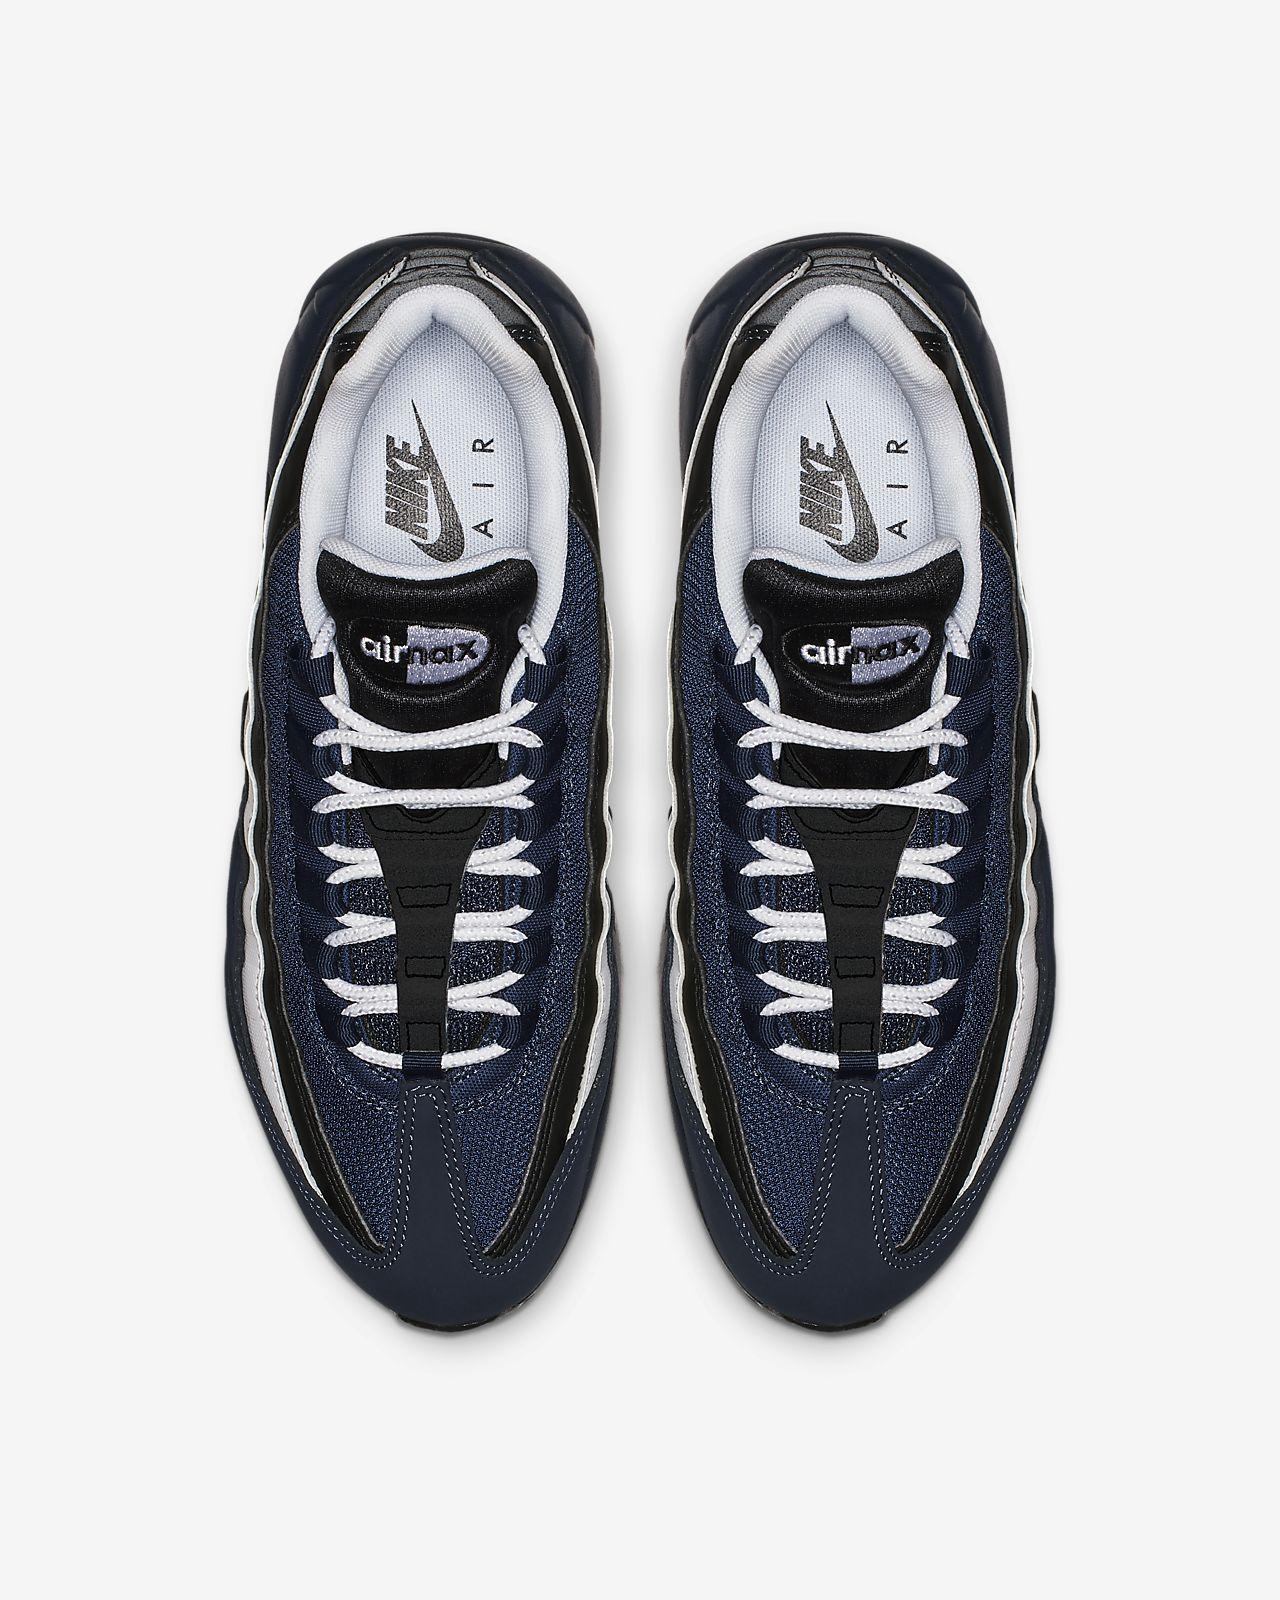 new product bd7a0 36c6d ... Calzado para hombre Nike Air Max 95 Essential